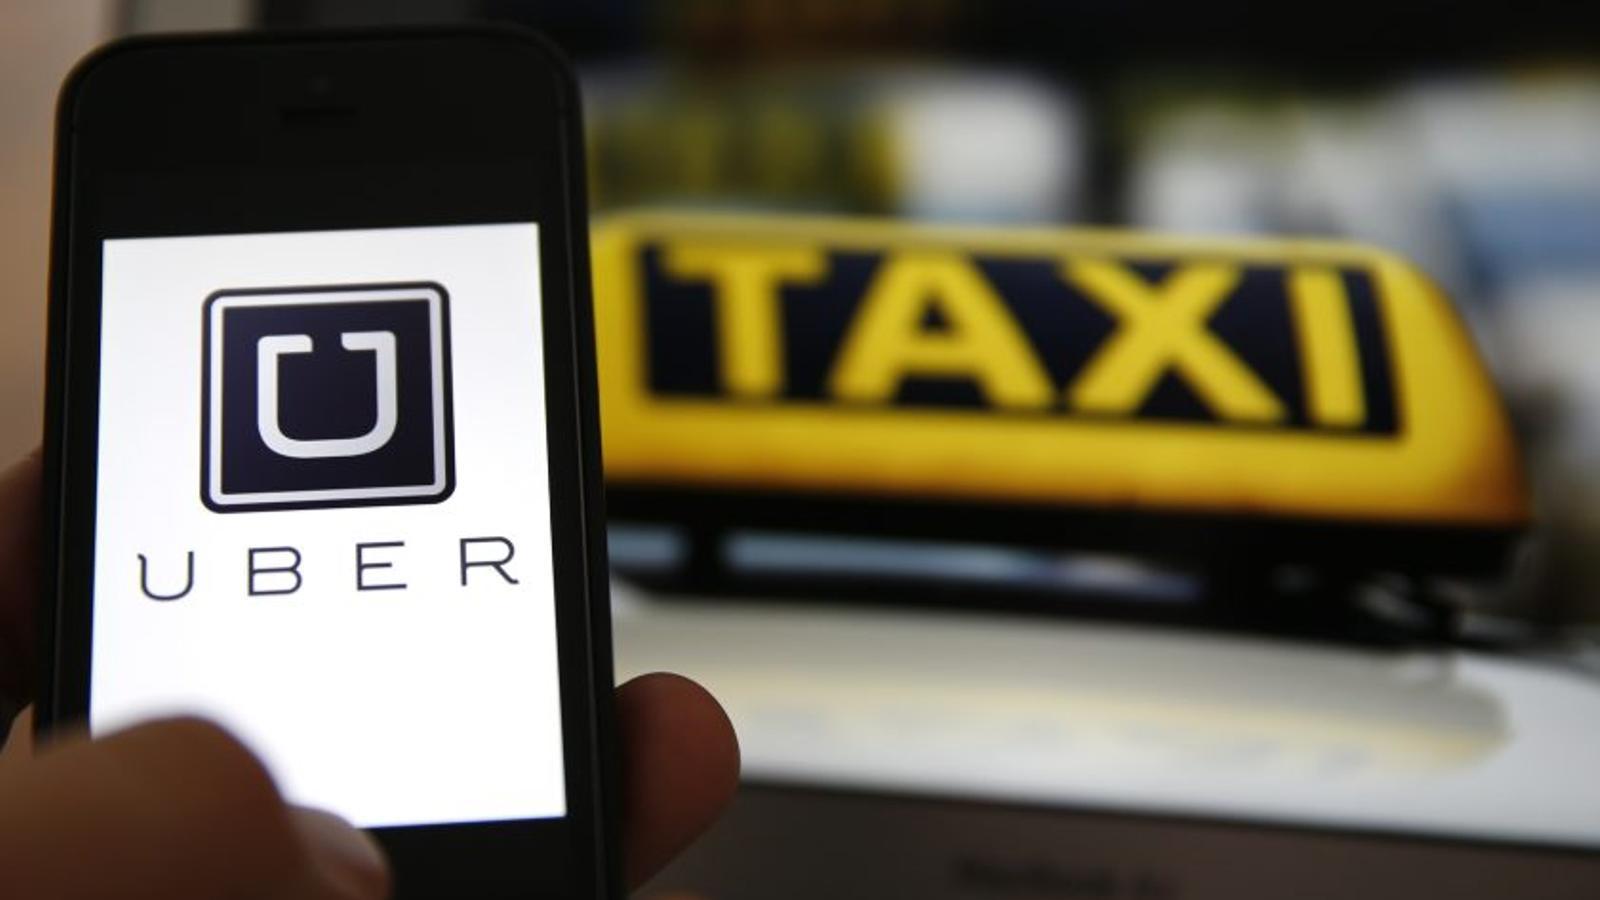 Uber i Cabify abandonen Barcelona